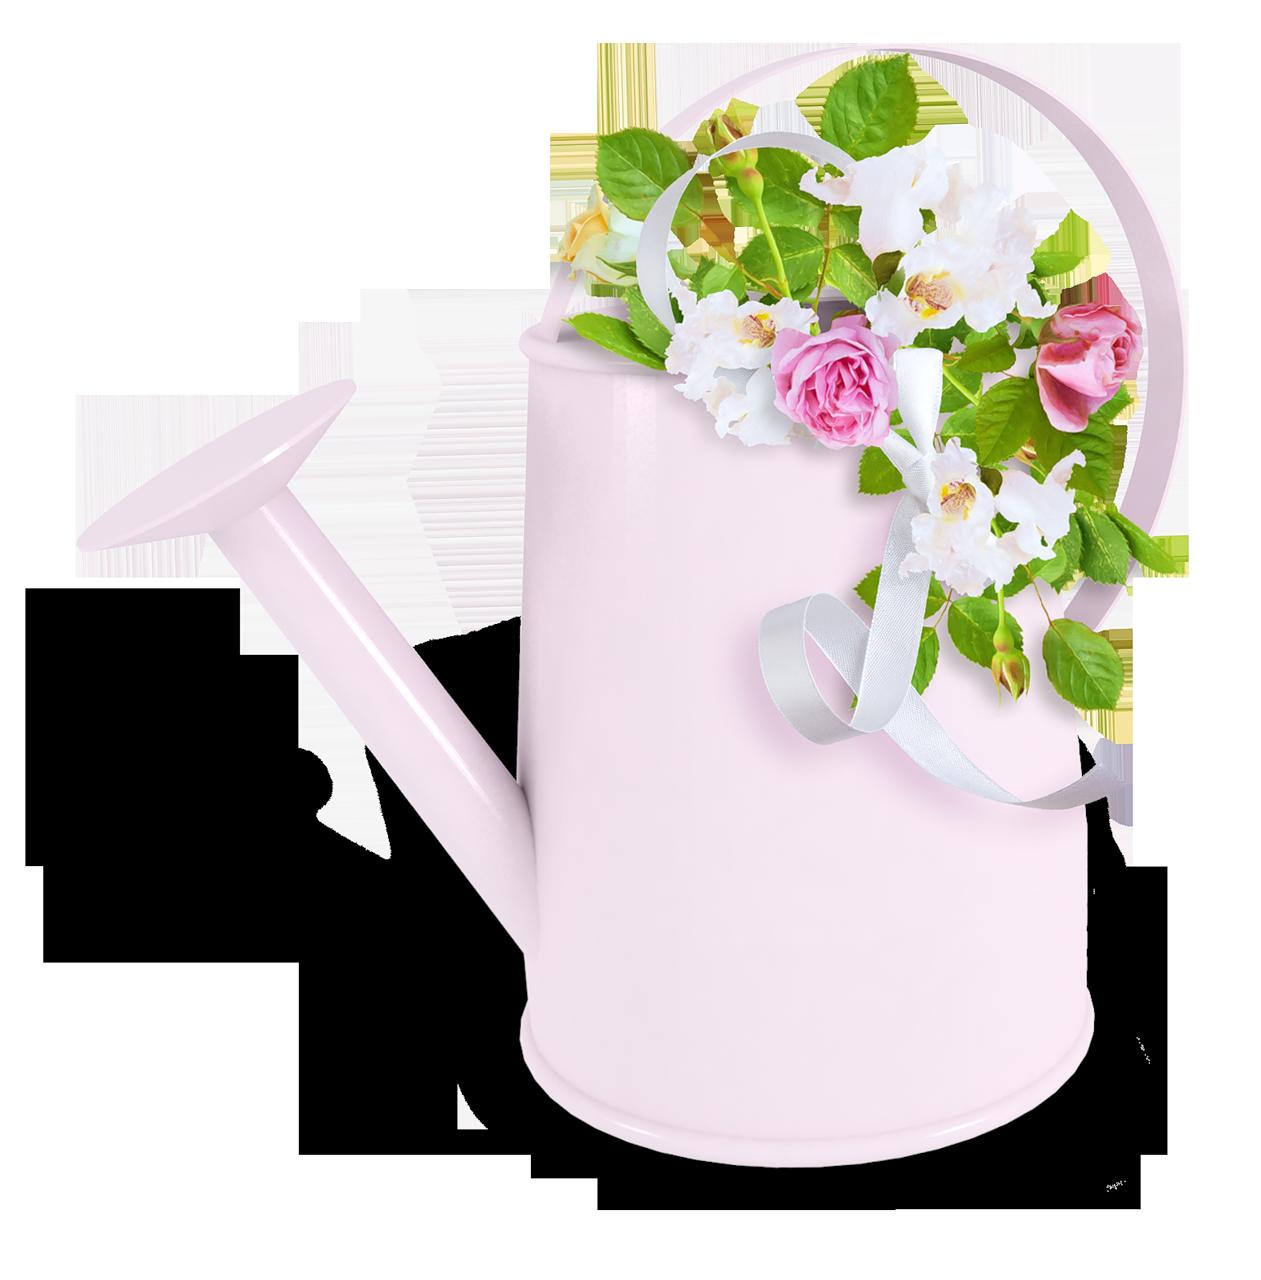 Png - Dessiner un vase ...